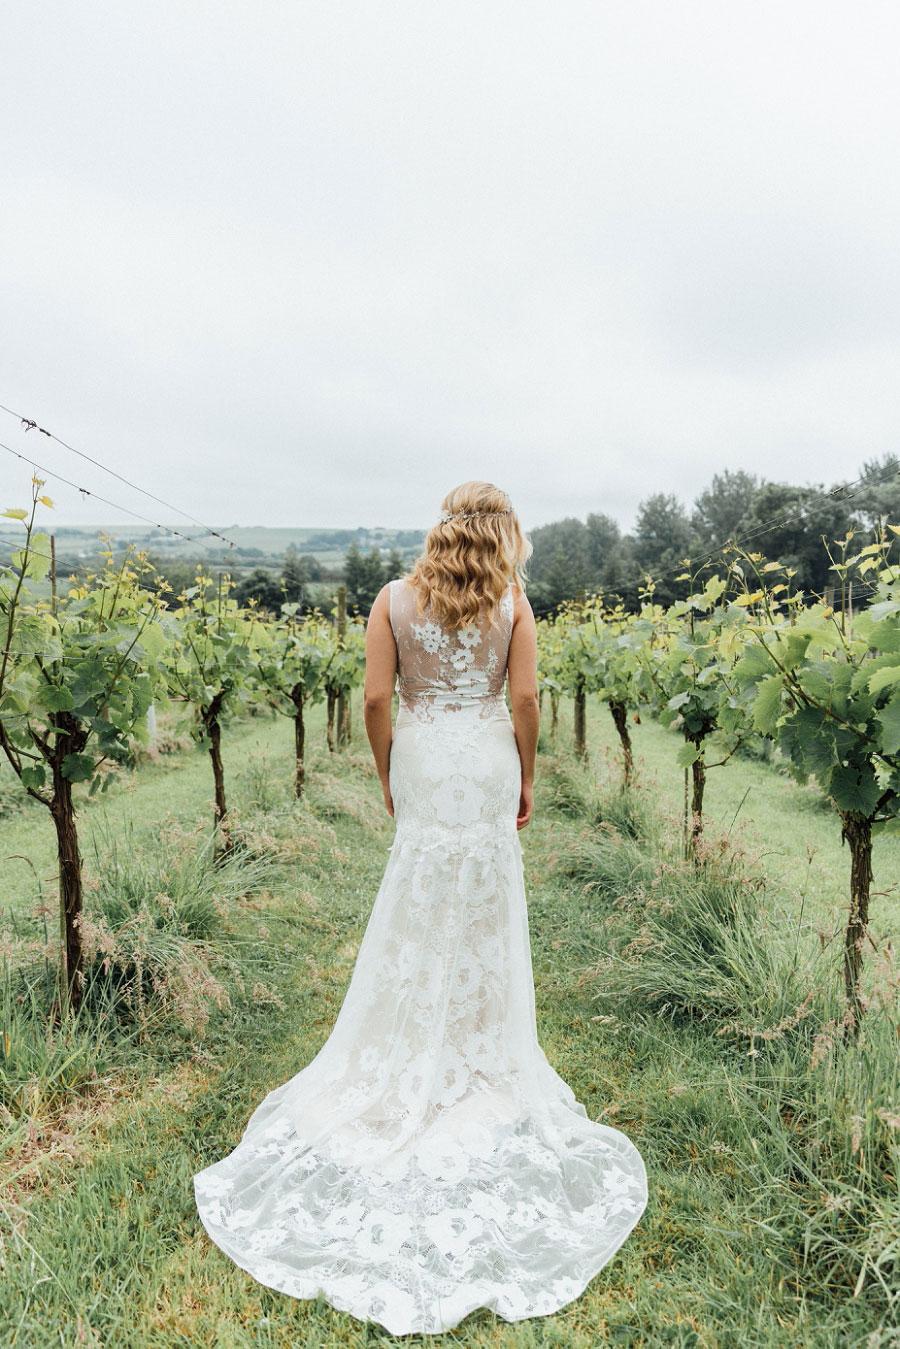 Romantic Vineyard Bridal Shoot With Dusty Blues & Greys0037